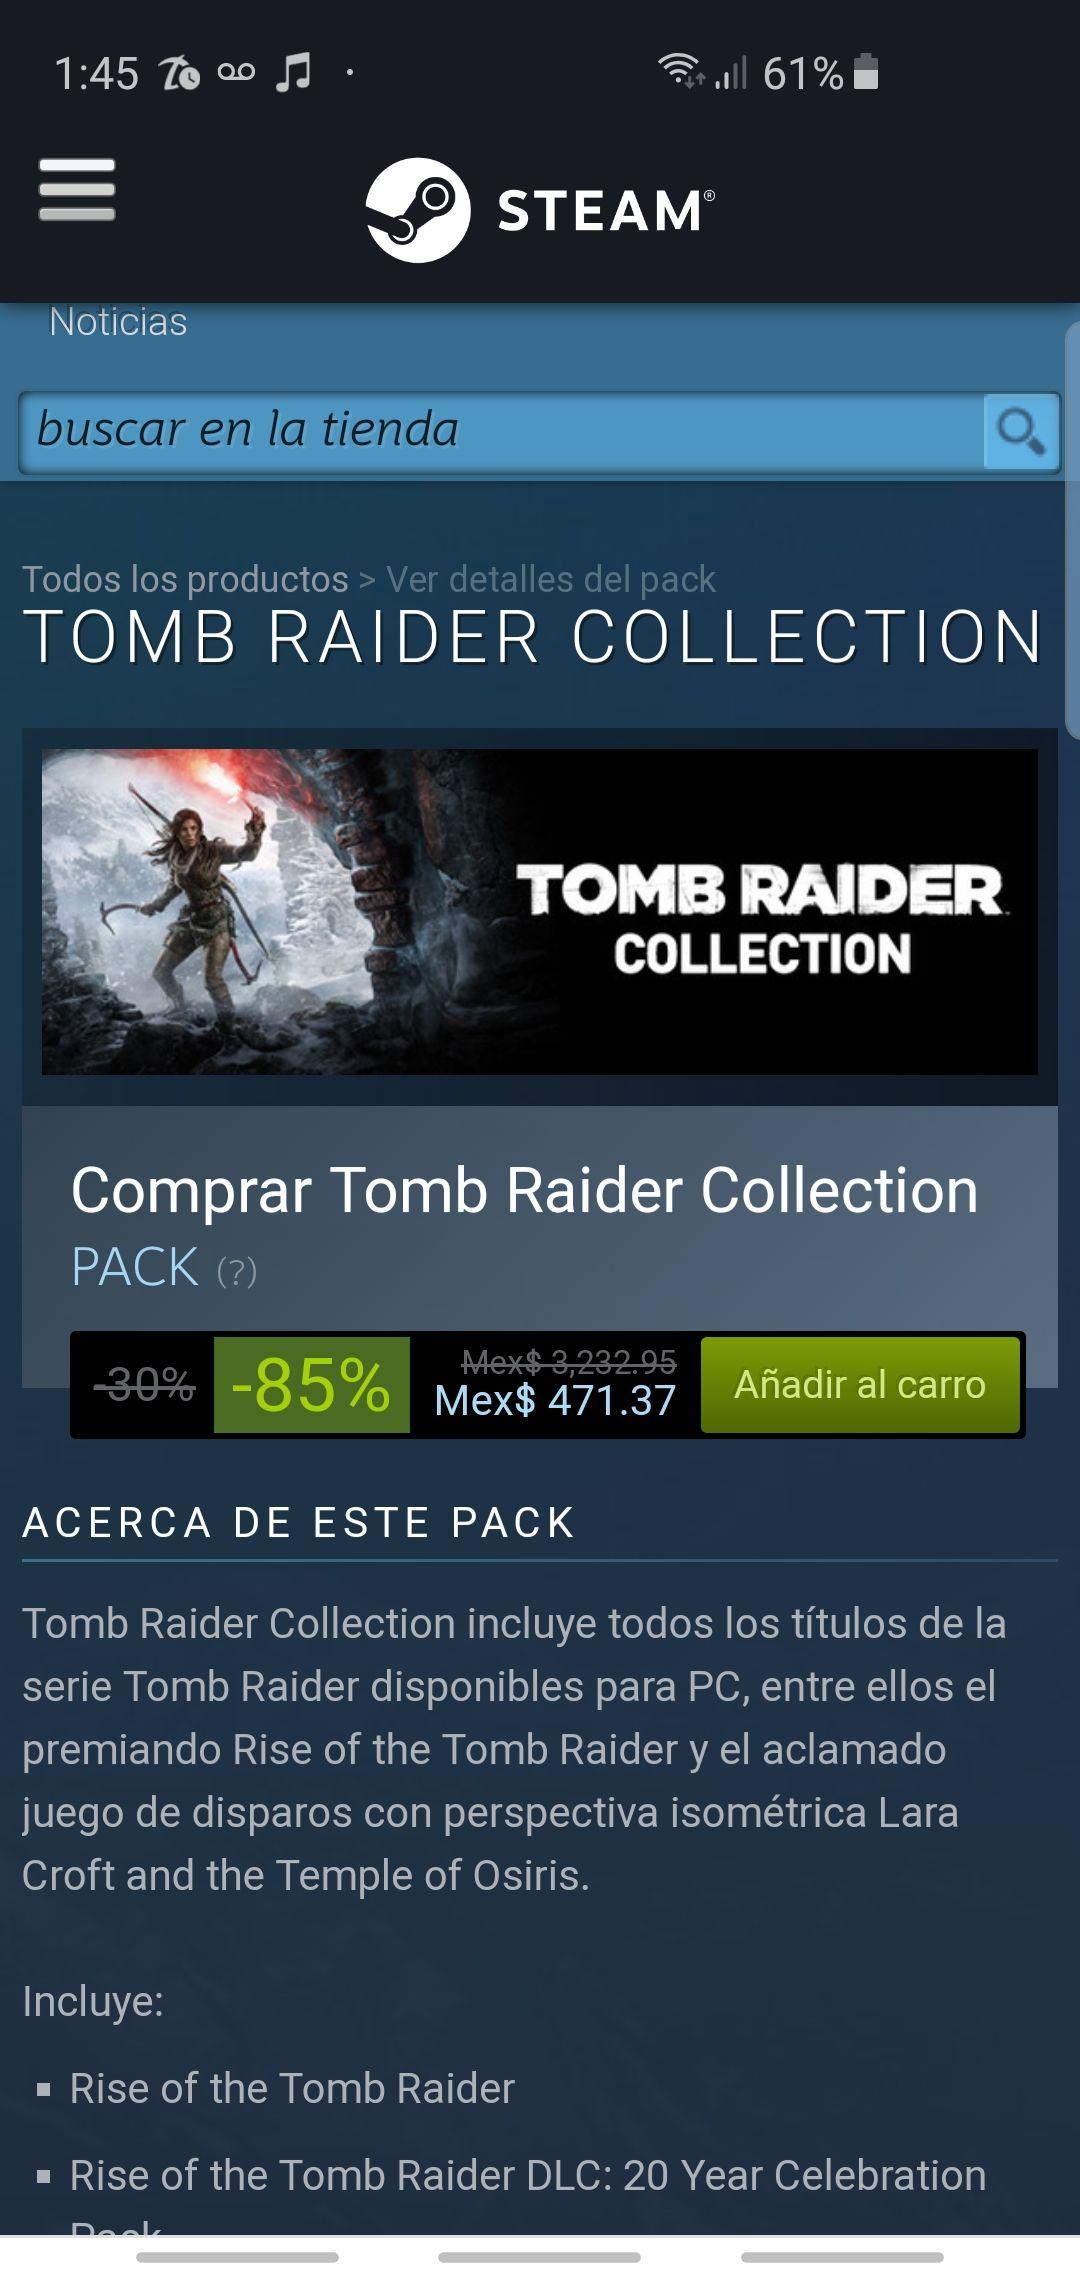 Steam TOMB RAIDER COLLECTION